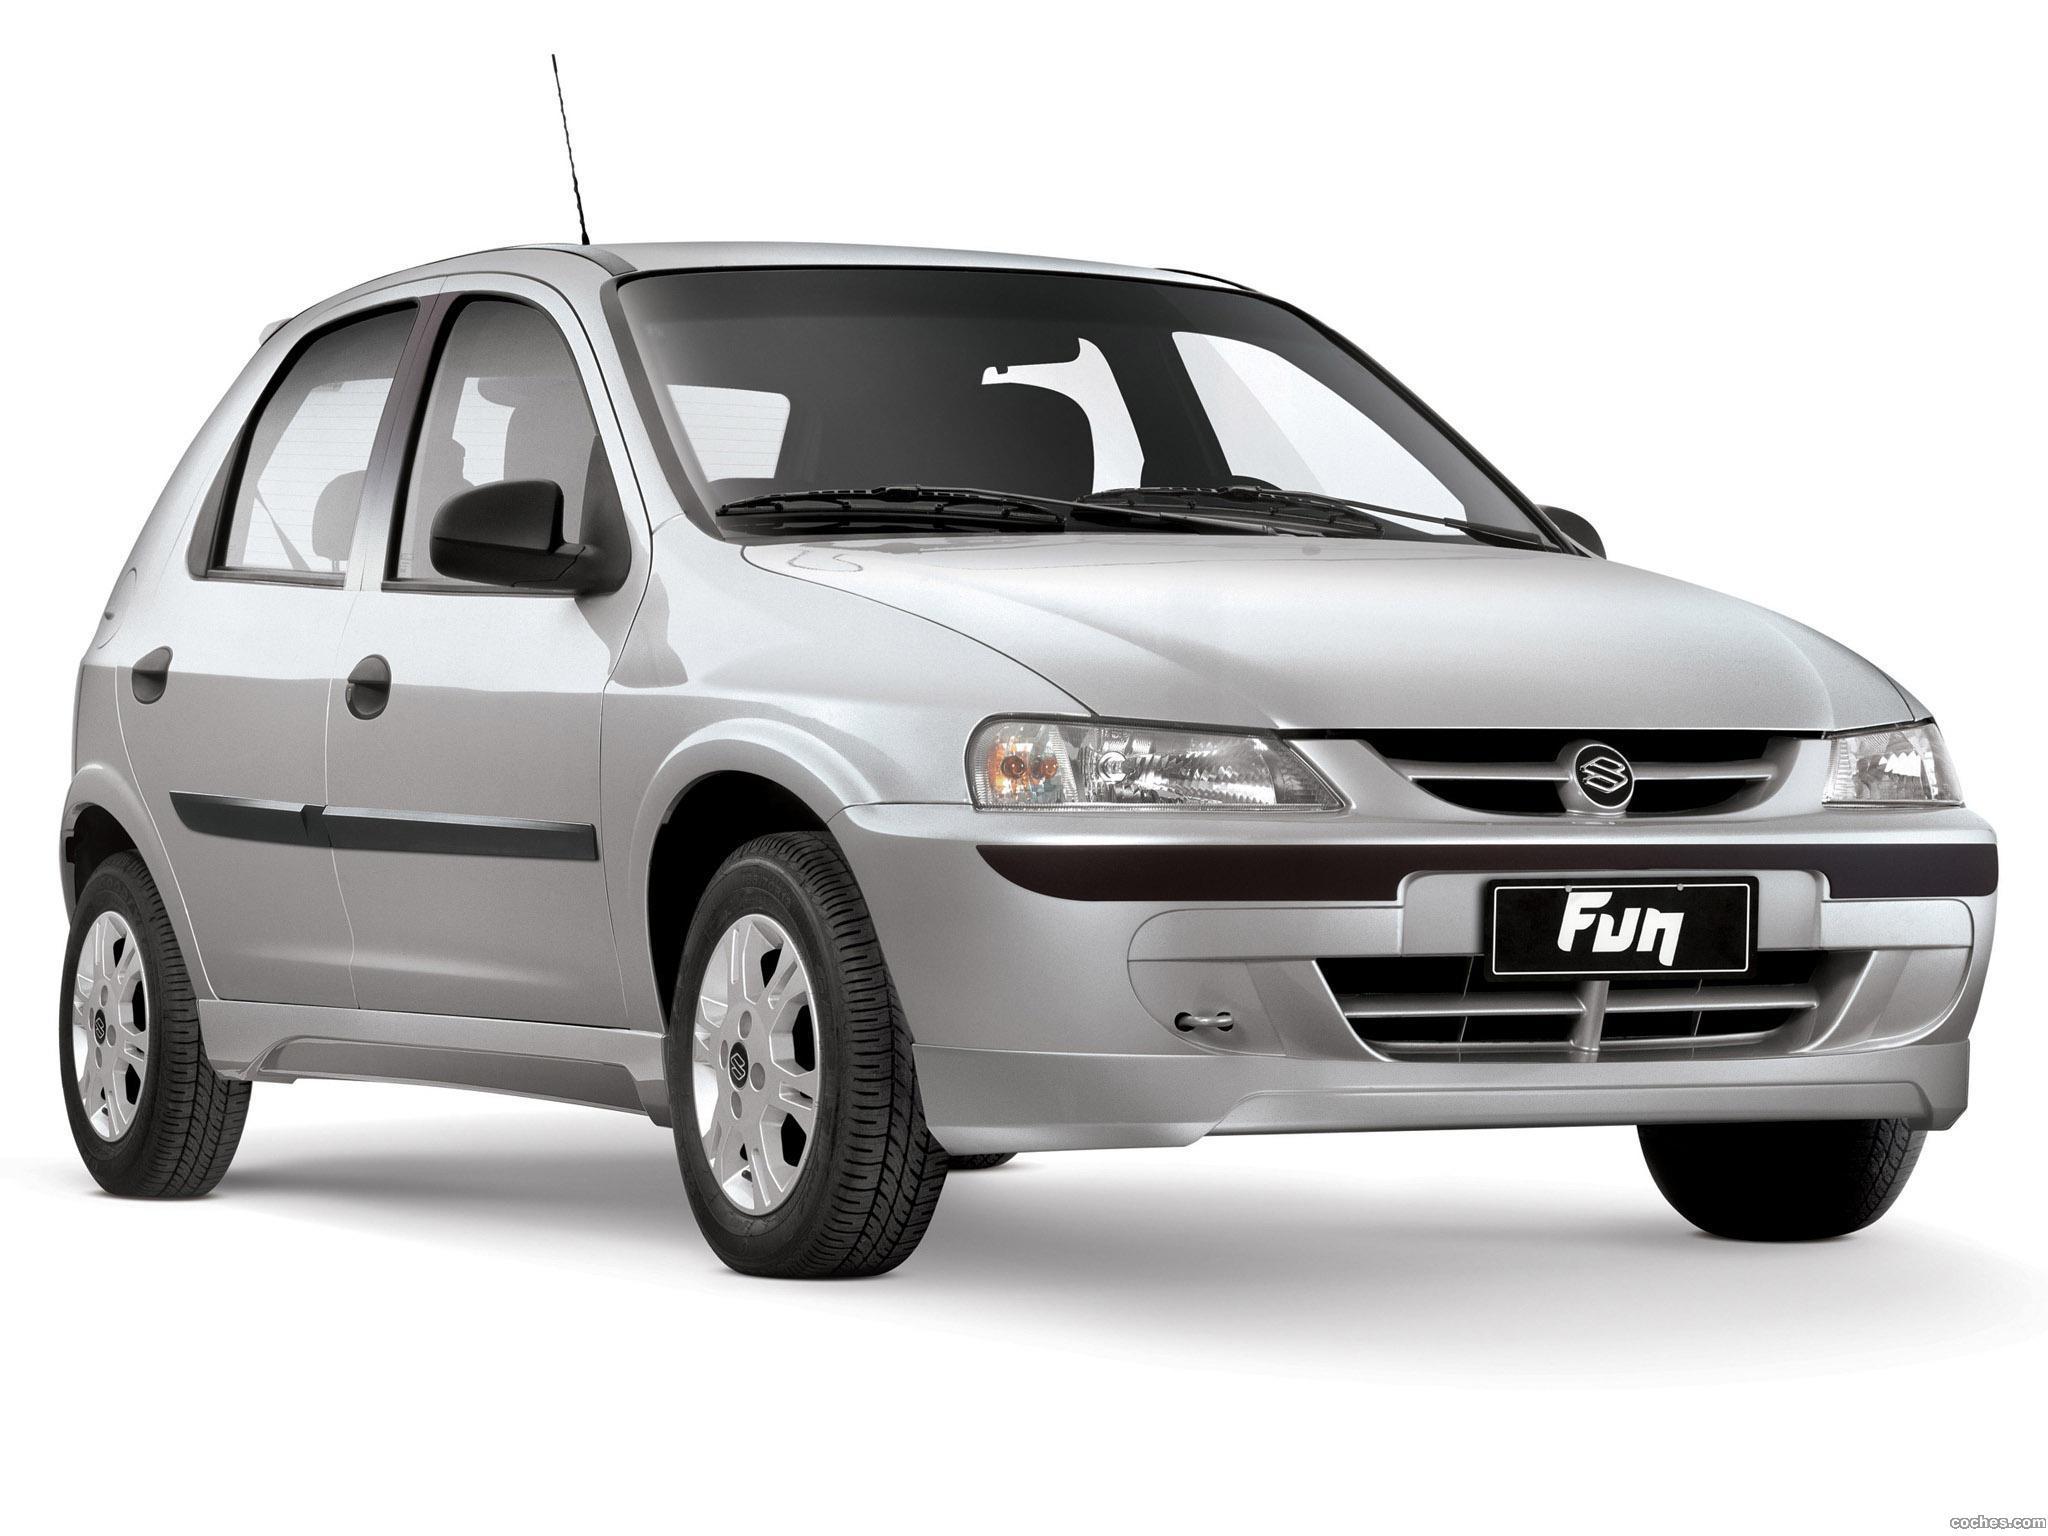 Foto 0 de Suzuki Fun 5 puertas 2000